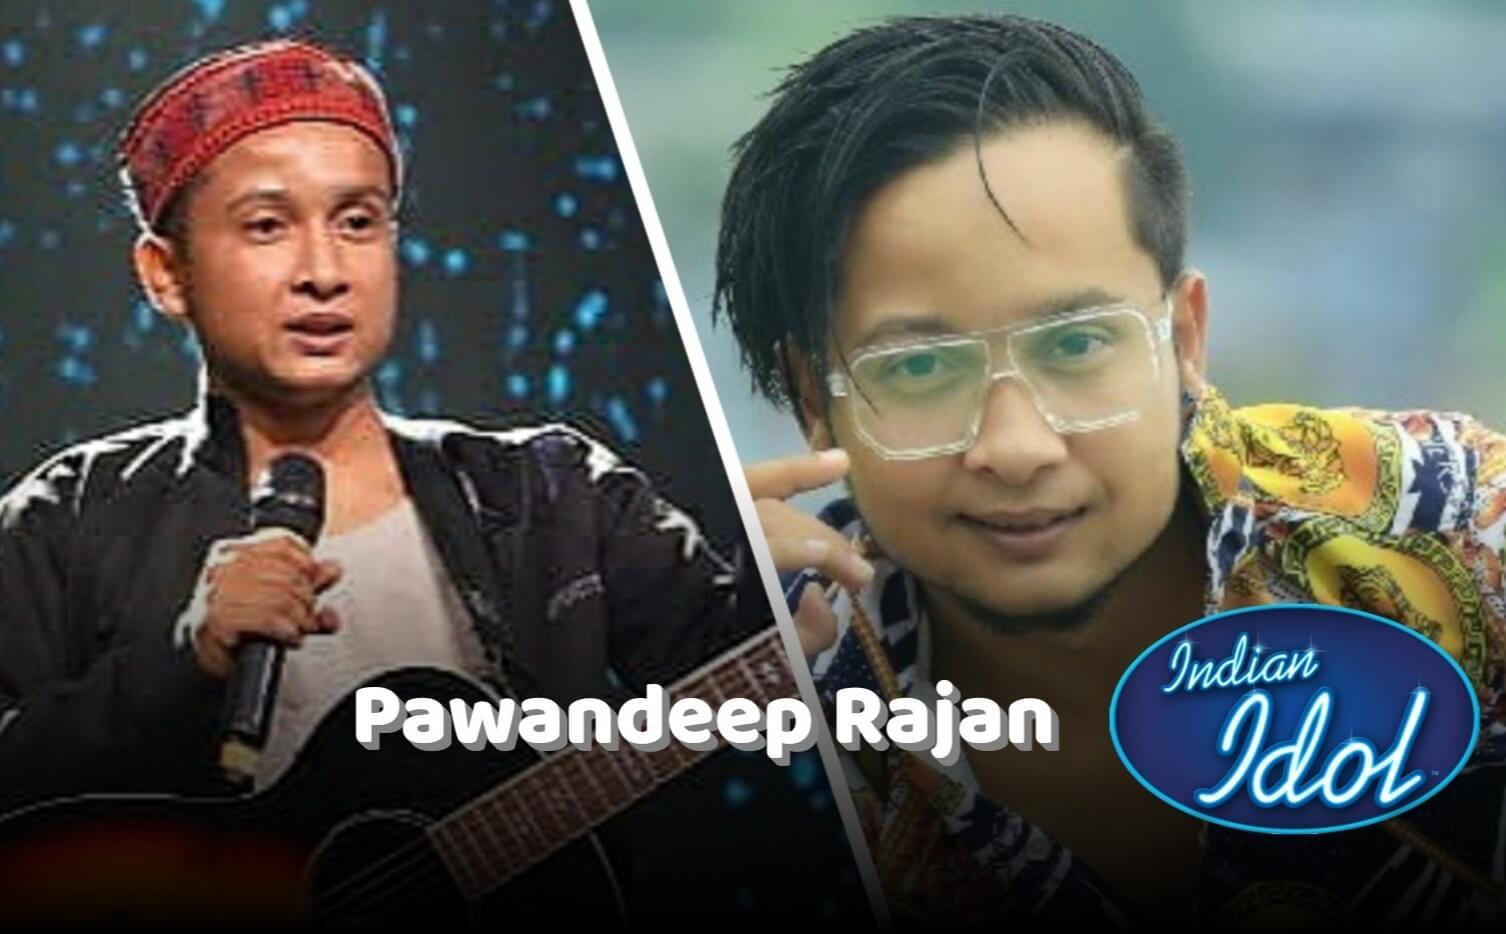 Pawandeep-Rajan-Indian-Idol-2020-Contestant-Bio-Age-Wiki-Hometown